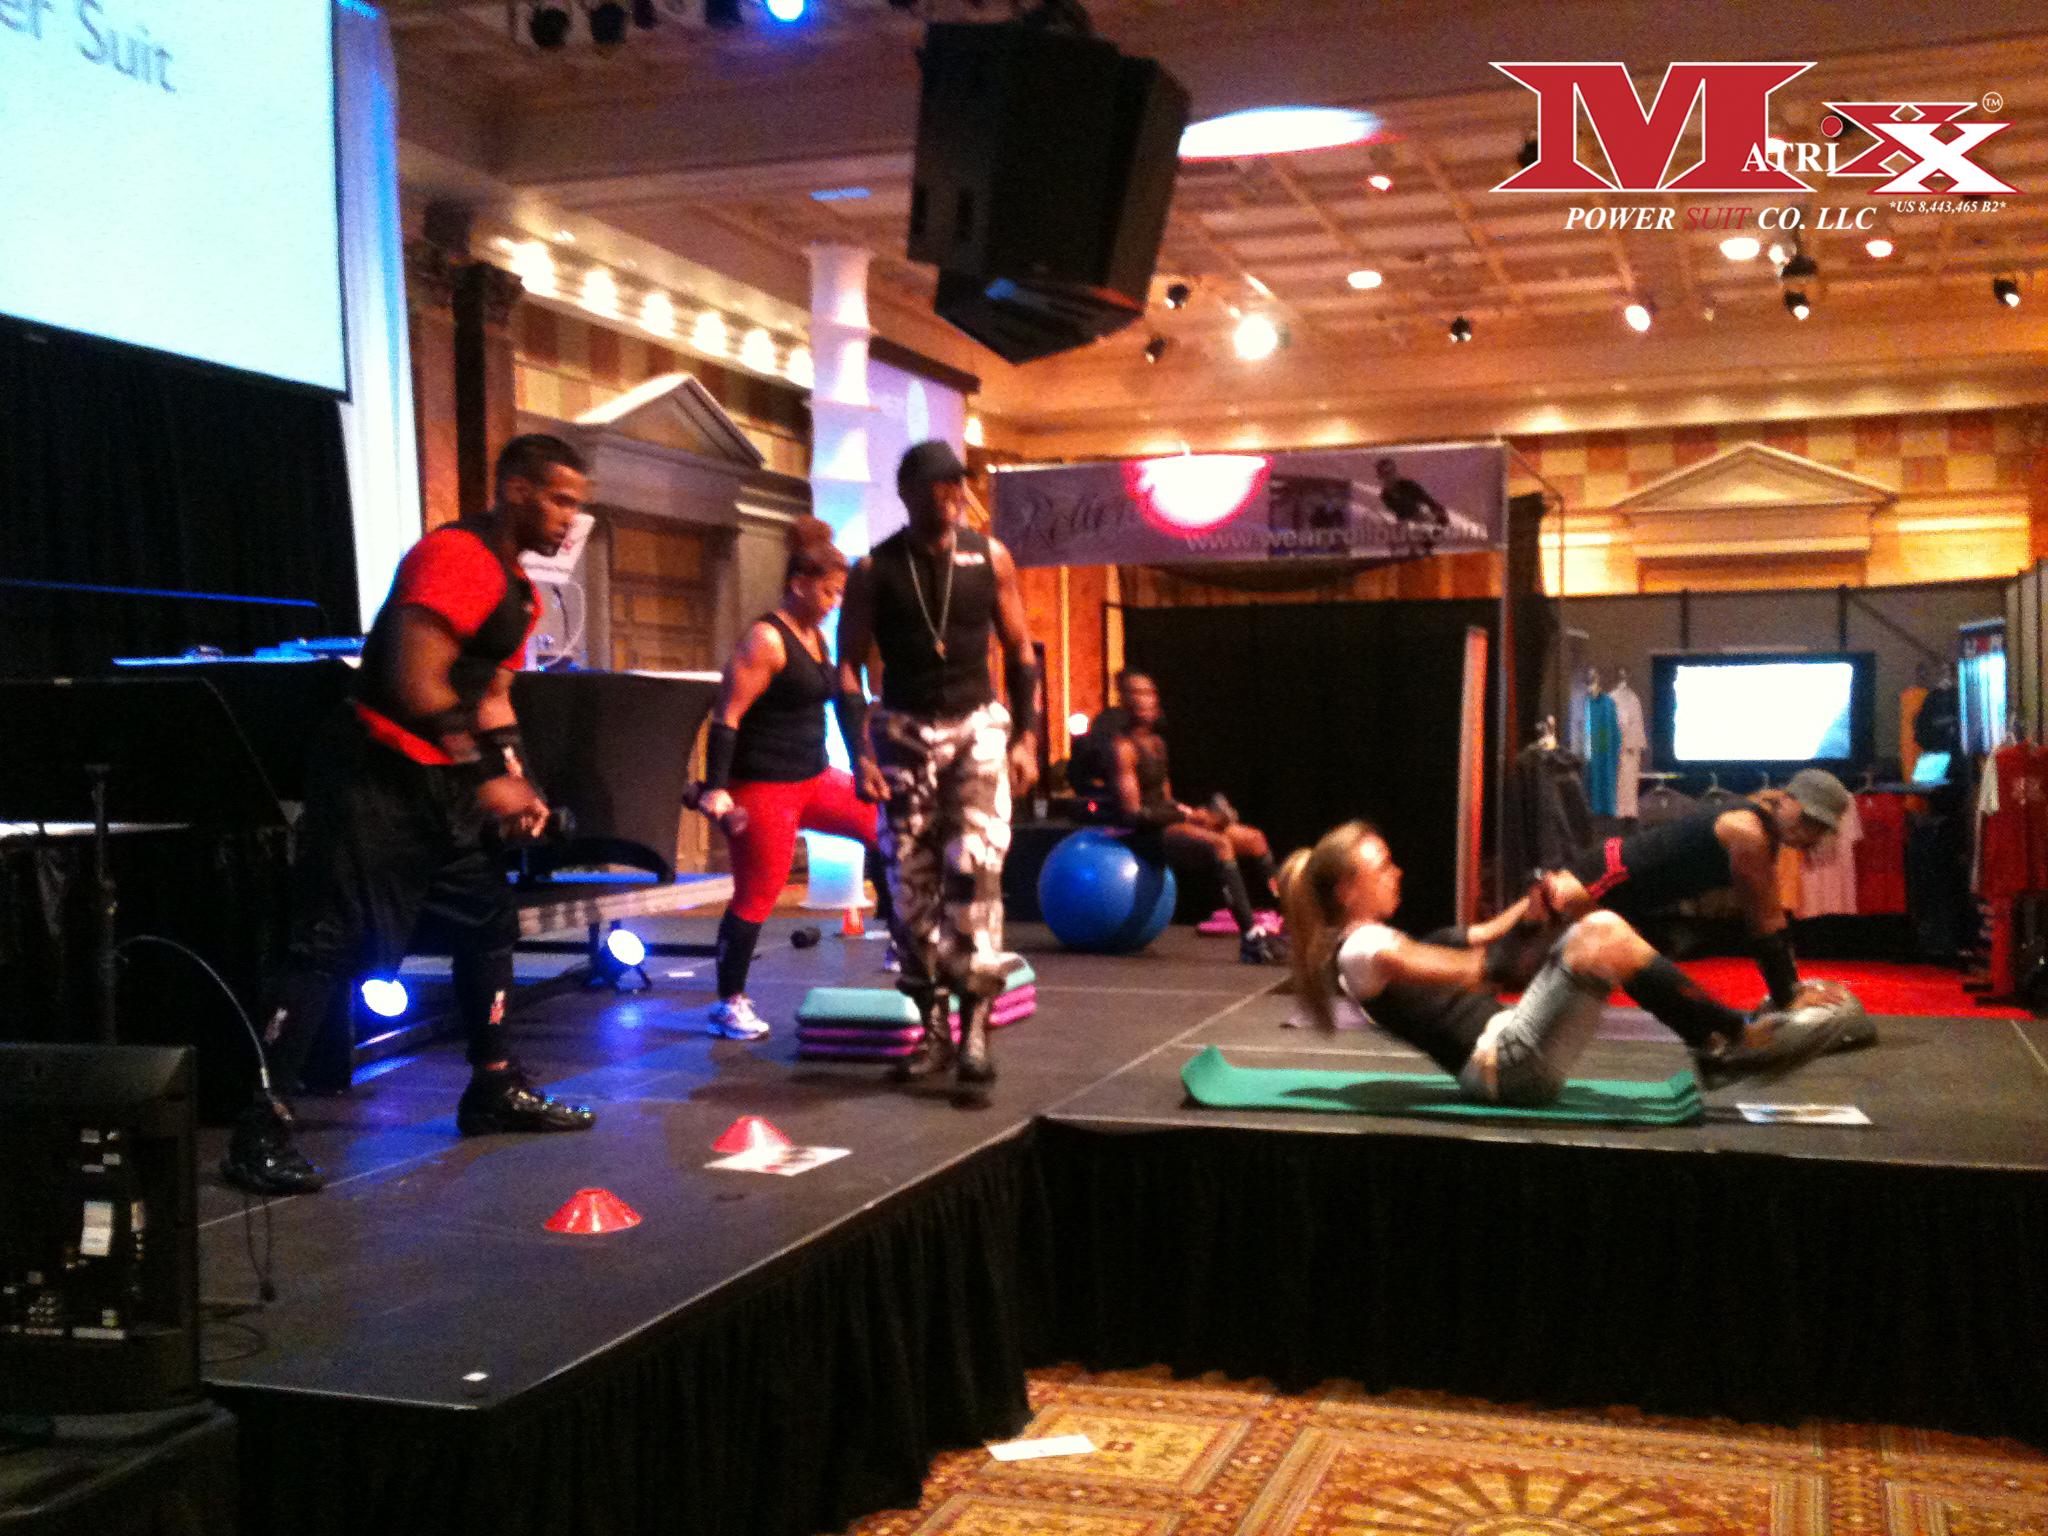 Matrixx Boot Camp at Sweat AC fitness show 2012